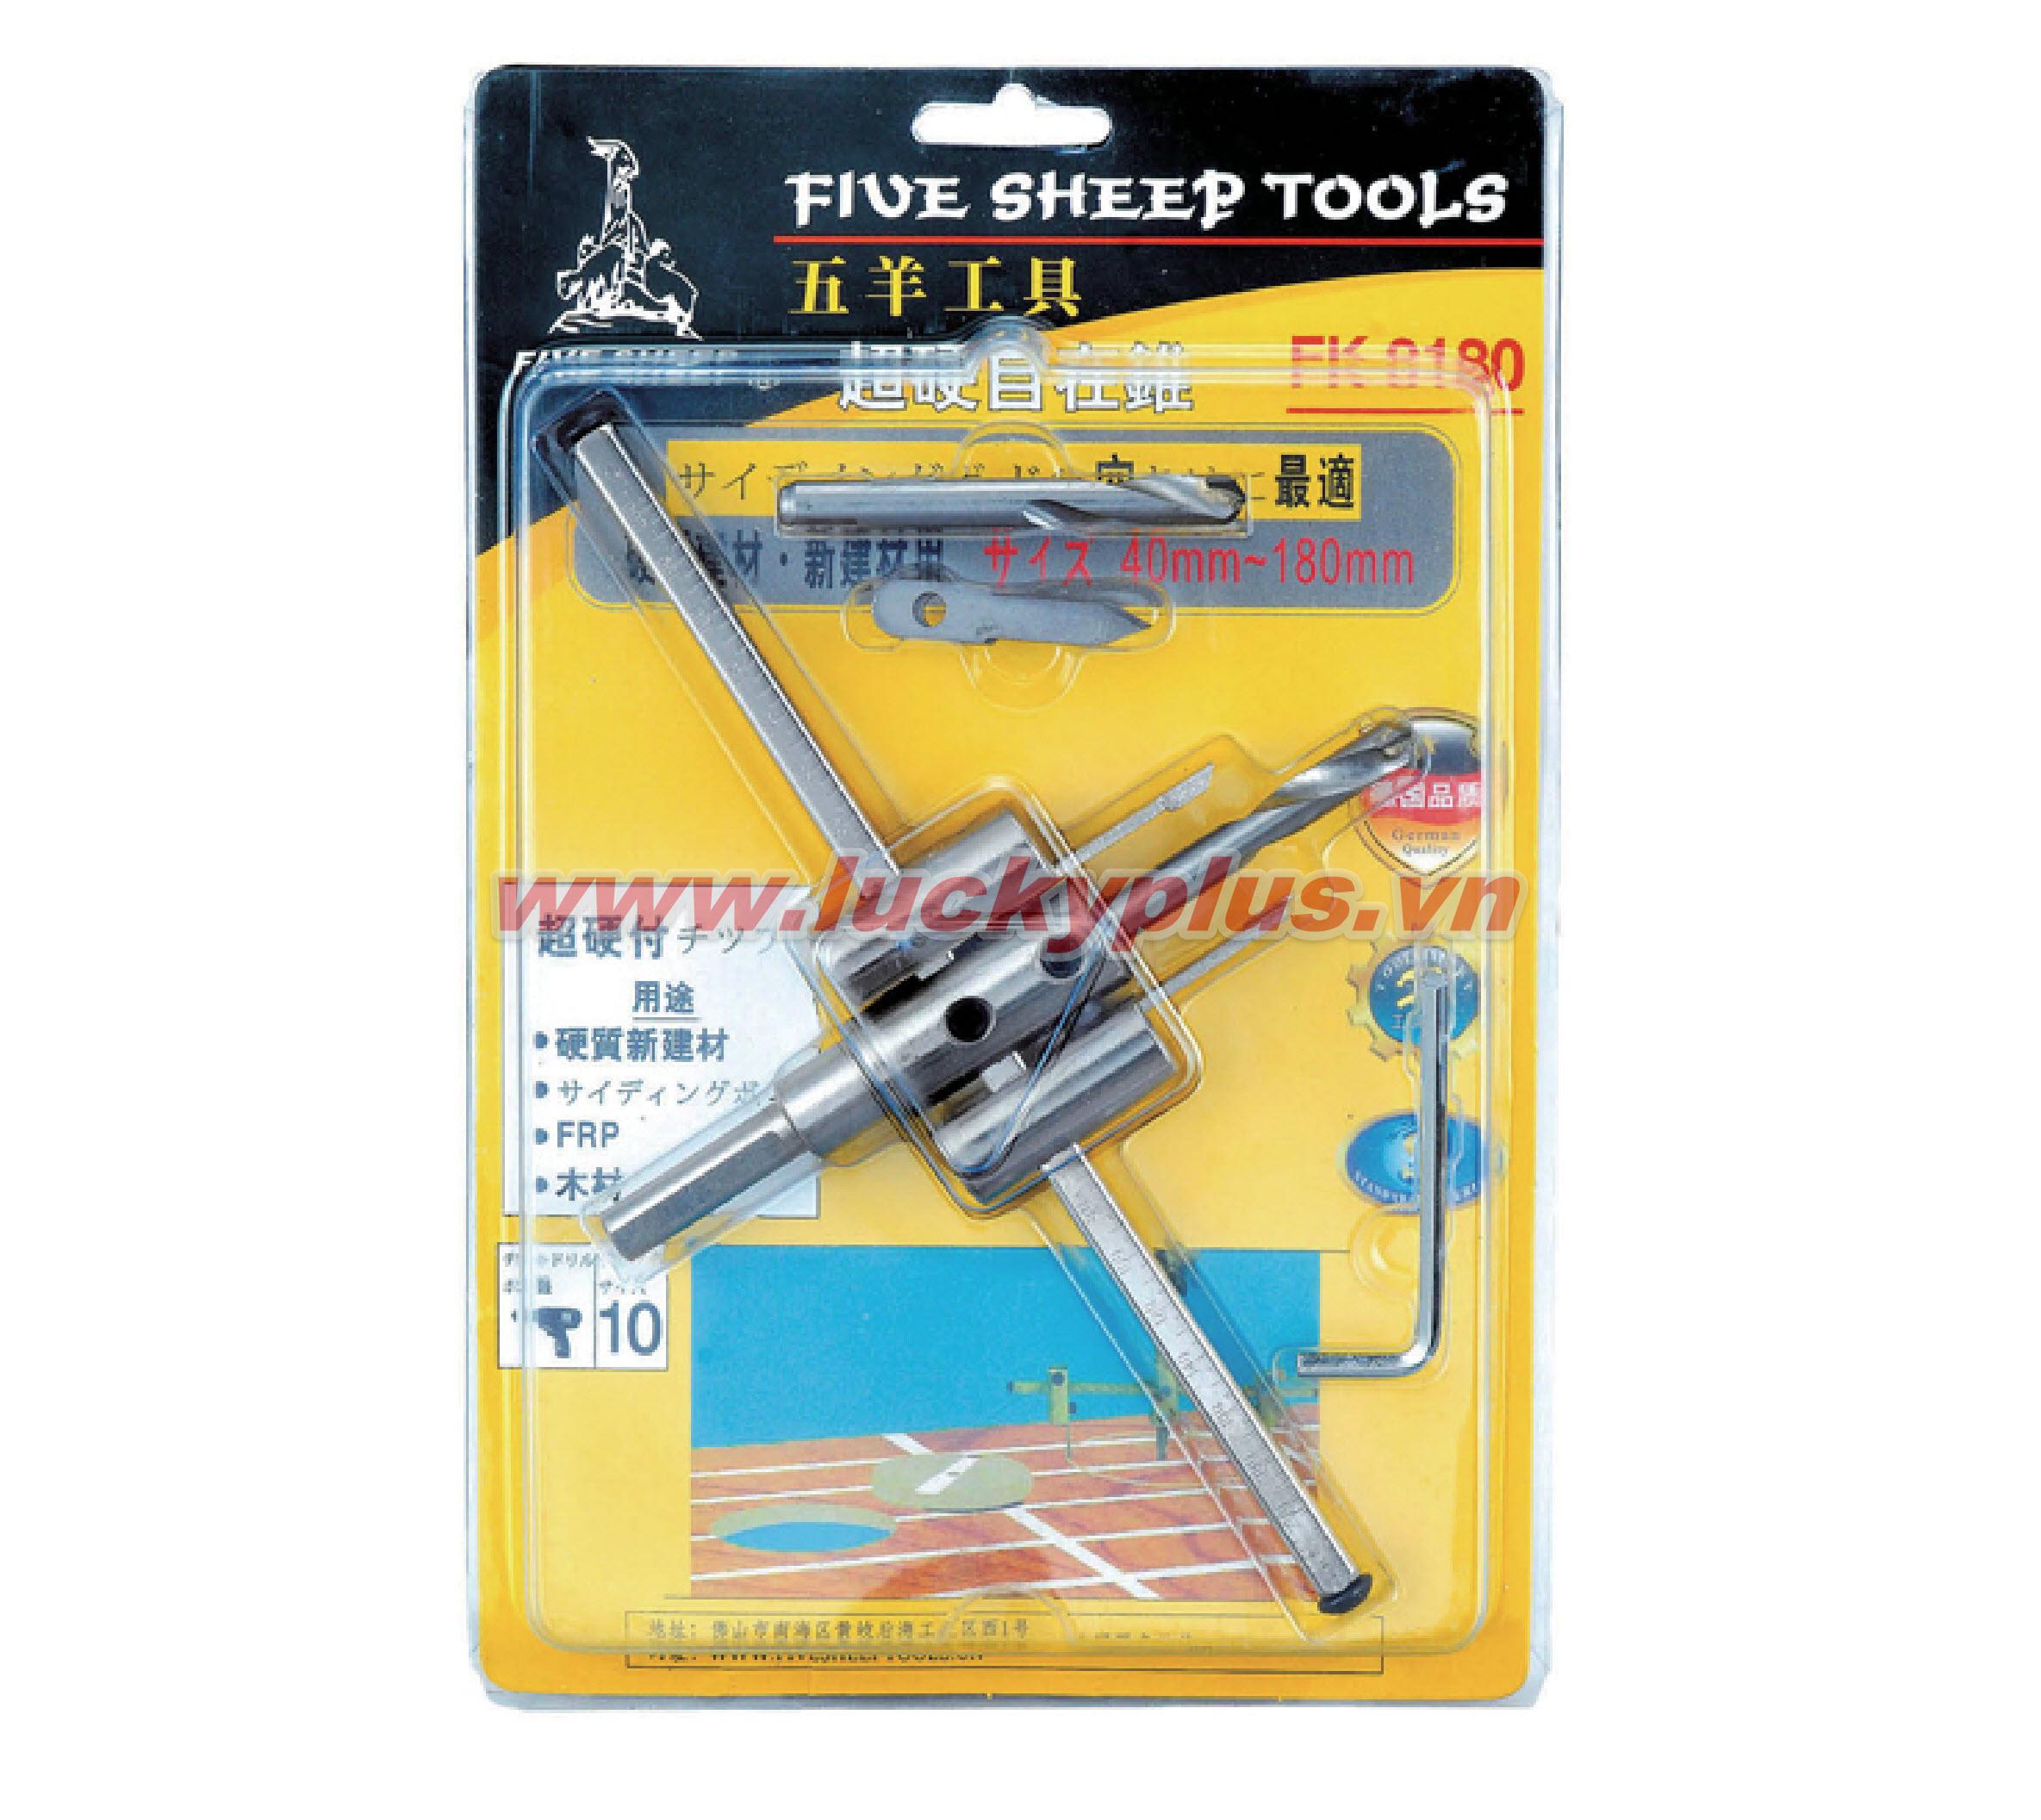 Mũi khoét lỗ FiveSheep FK-0180 40-180mm